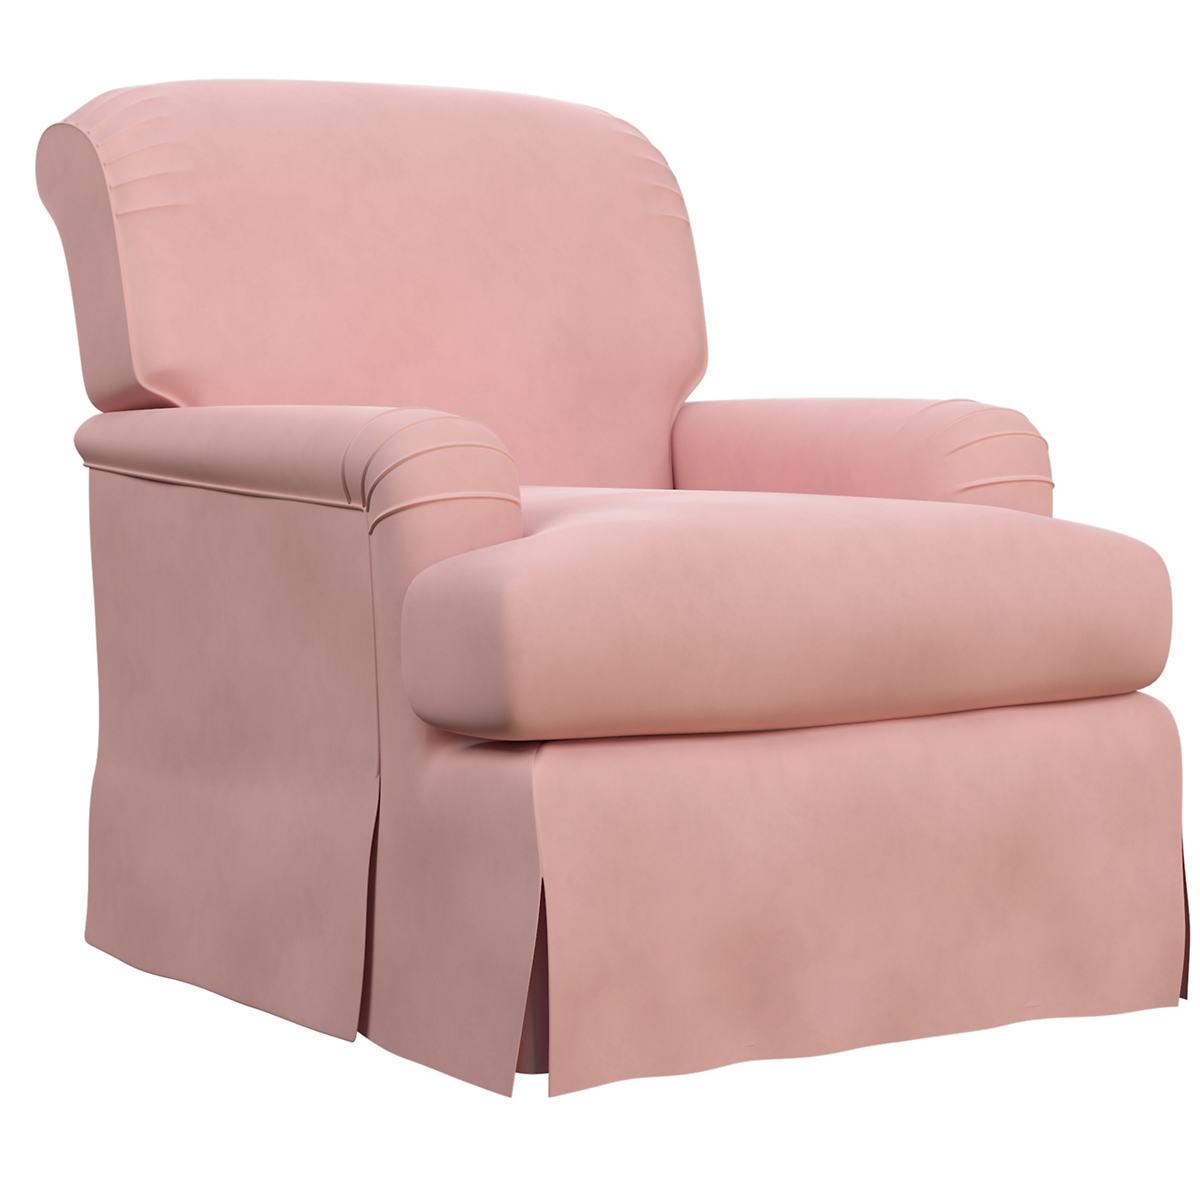 Velvesuede Lavender Rose Longford Chair